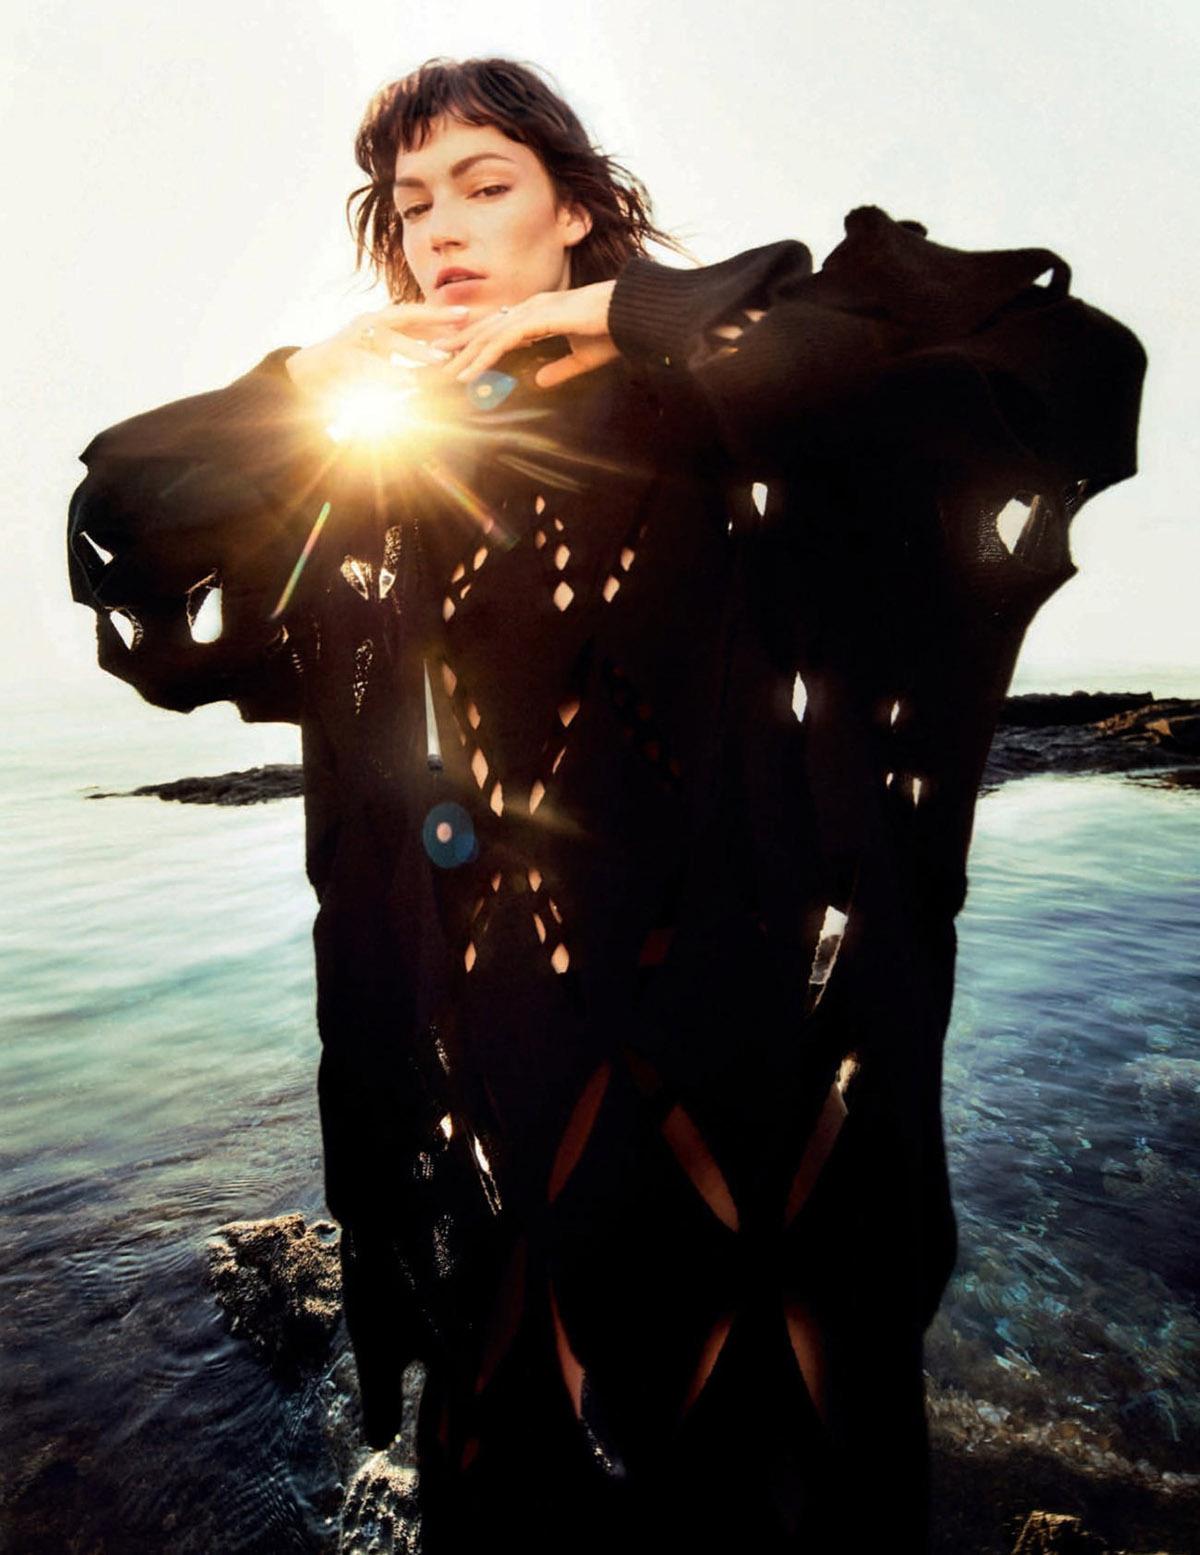 Úrsula Corberó covers Vogue Spain September 2021 by Txema Yeste